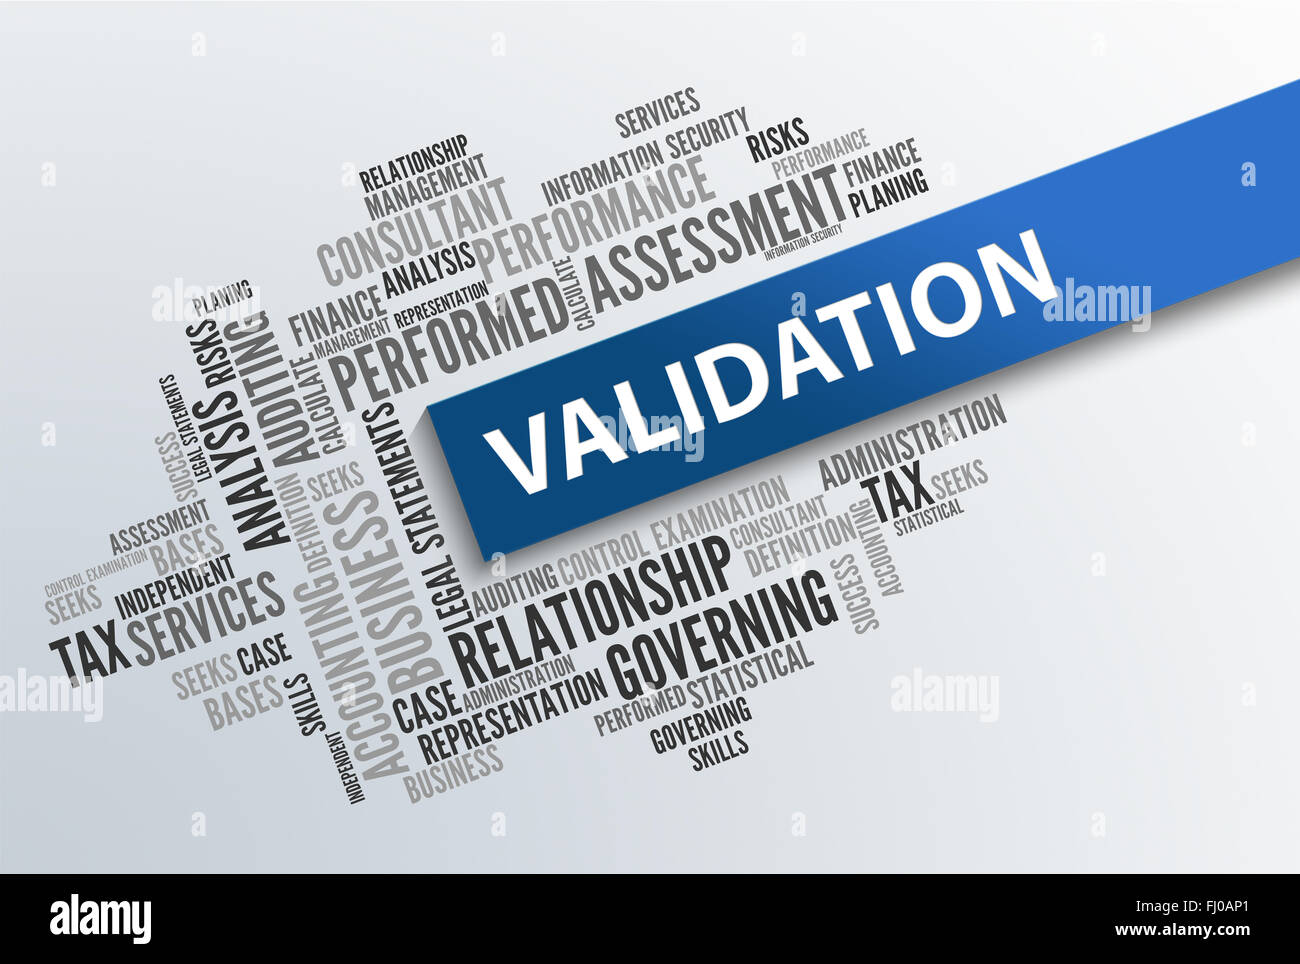 Validation   Business Wallpaper - Stock Image